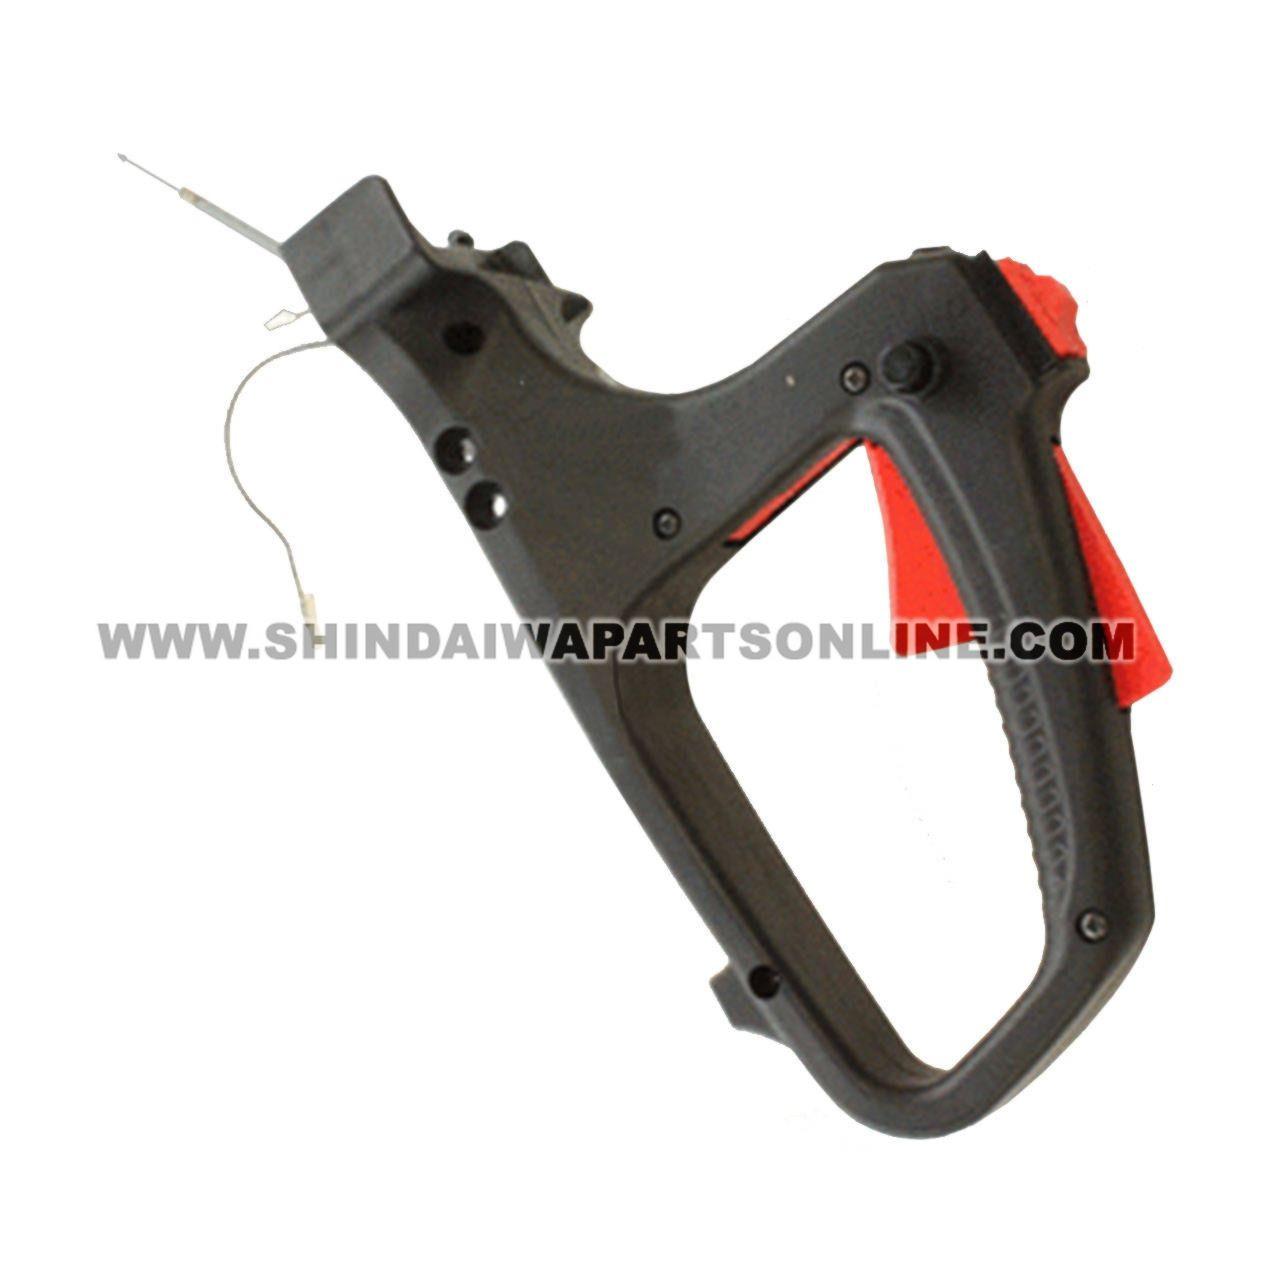 Shindaiwa C041000040 - Handle Rear Assy